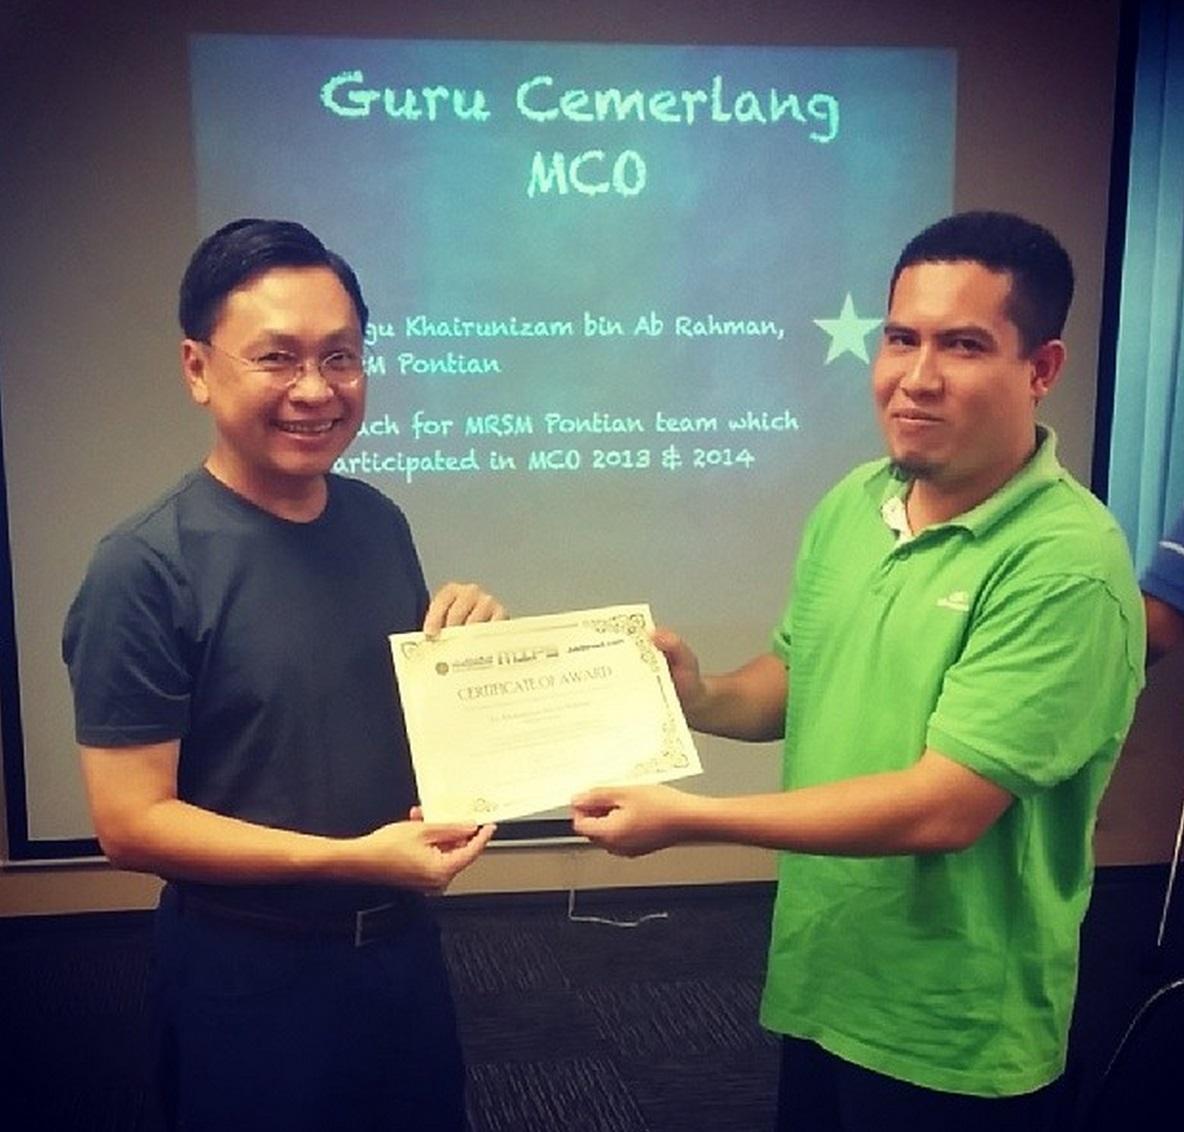 Mr Mark Chang presenting Cikgu Khairunizam from MRSM Pontian with the 'Guru Cemerlang MCO' award.